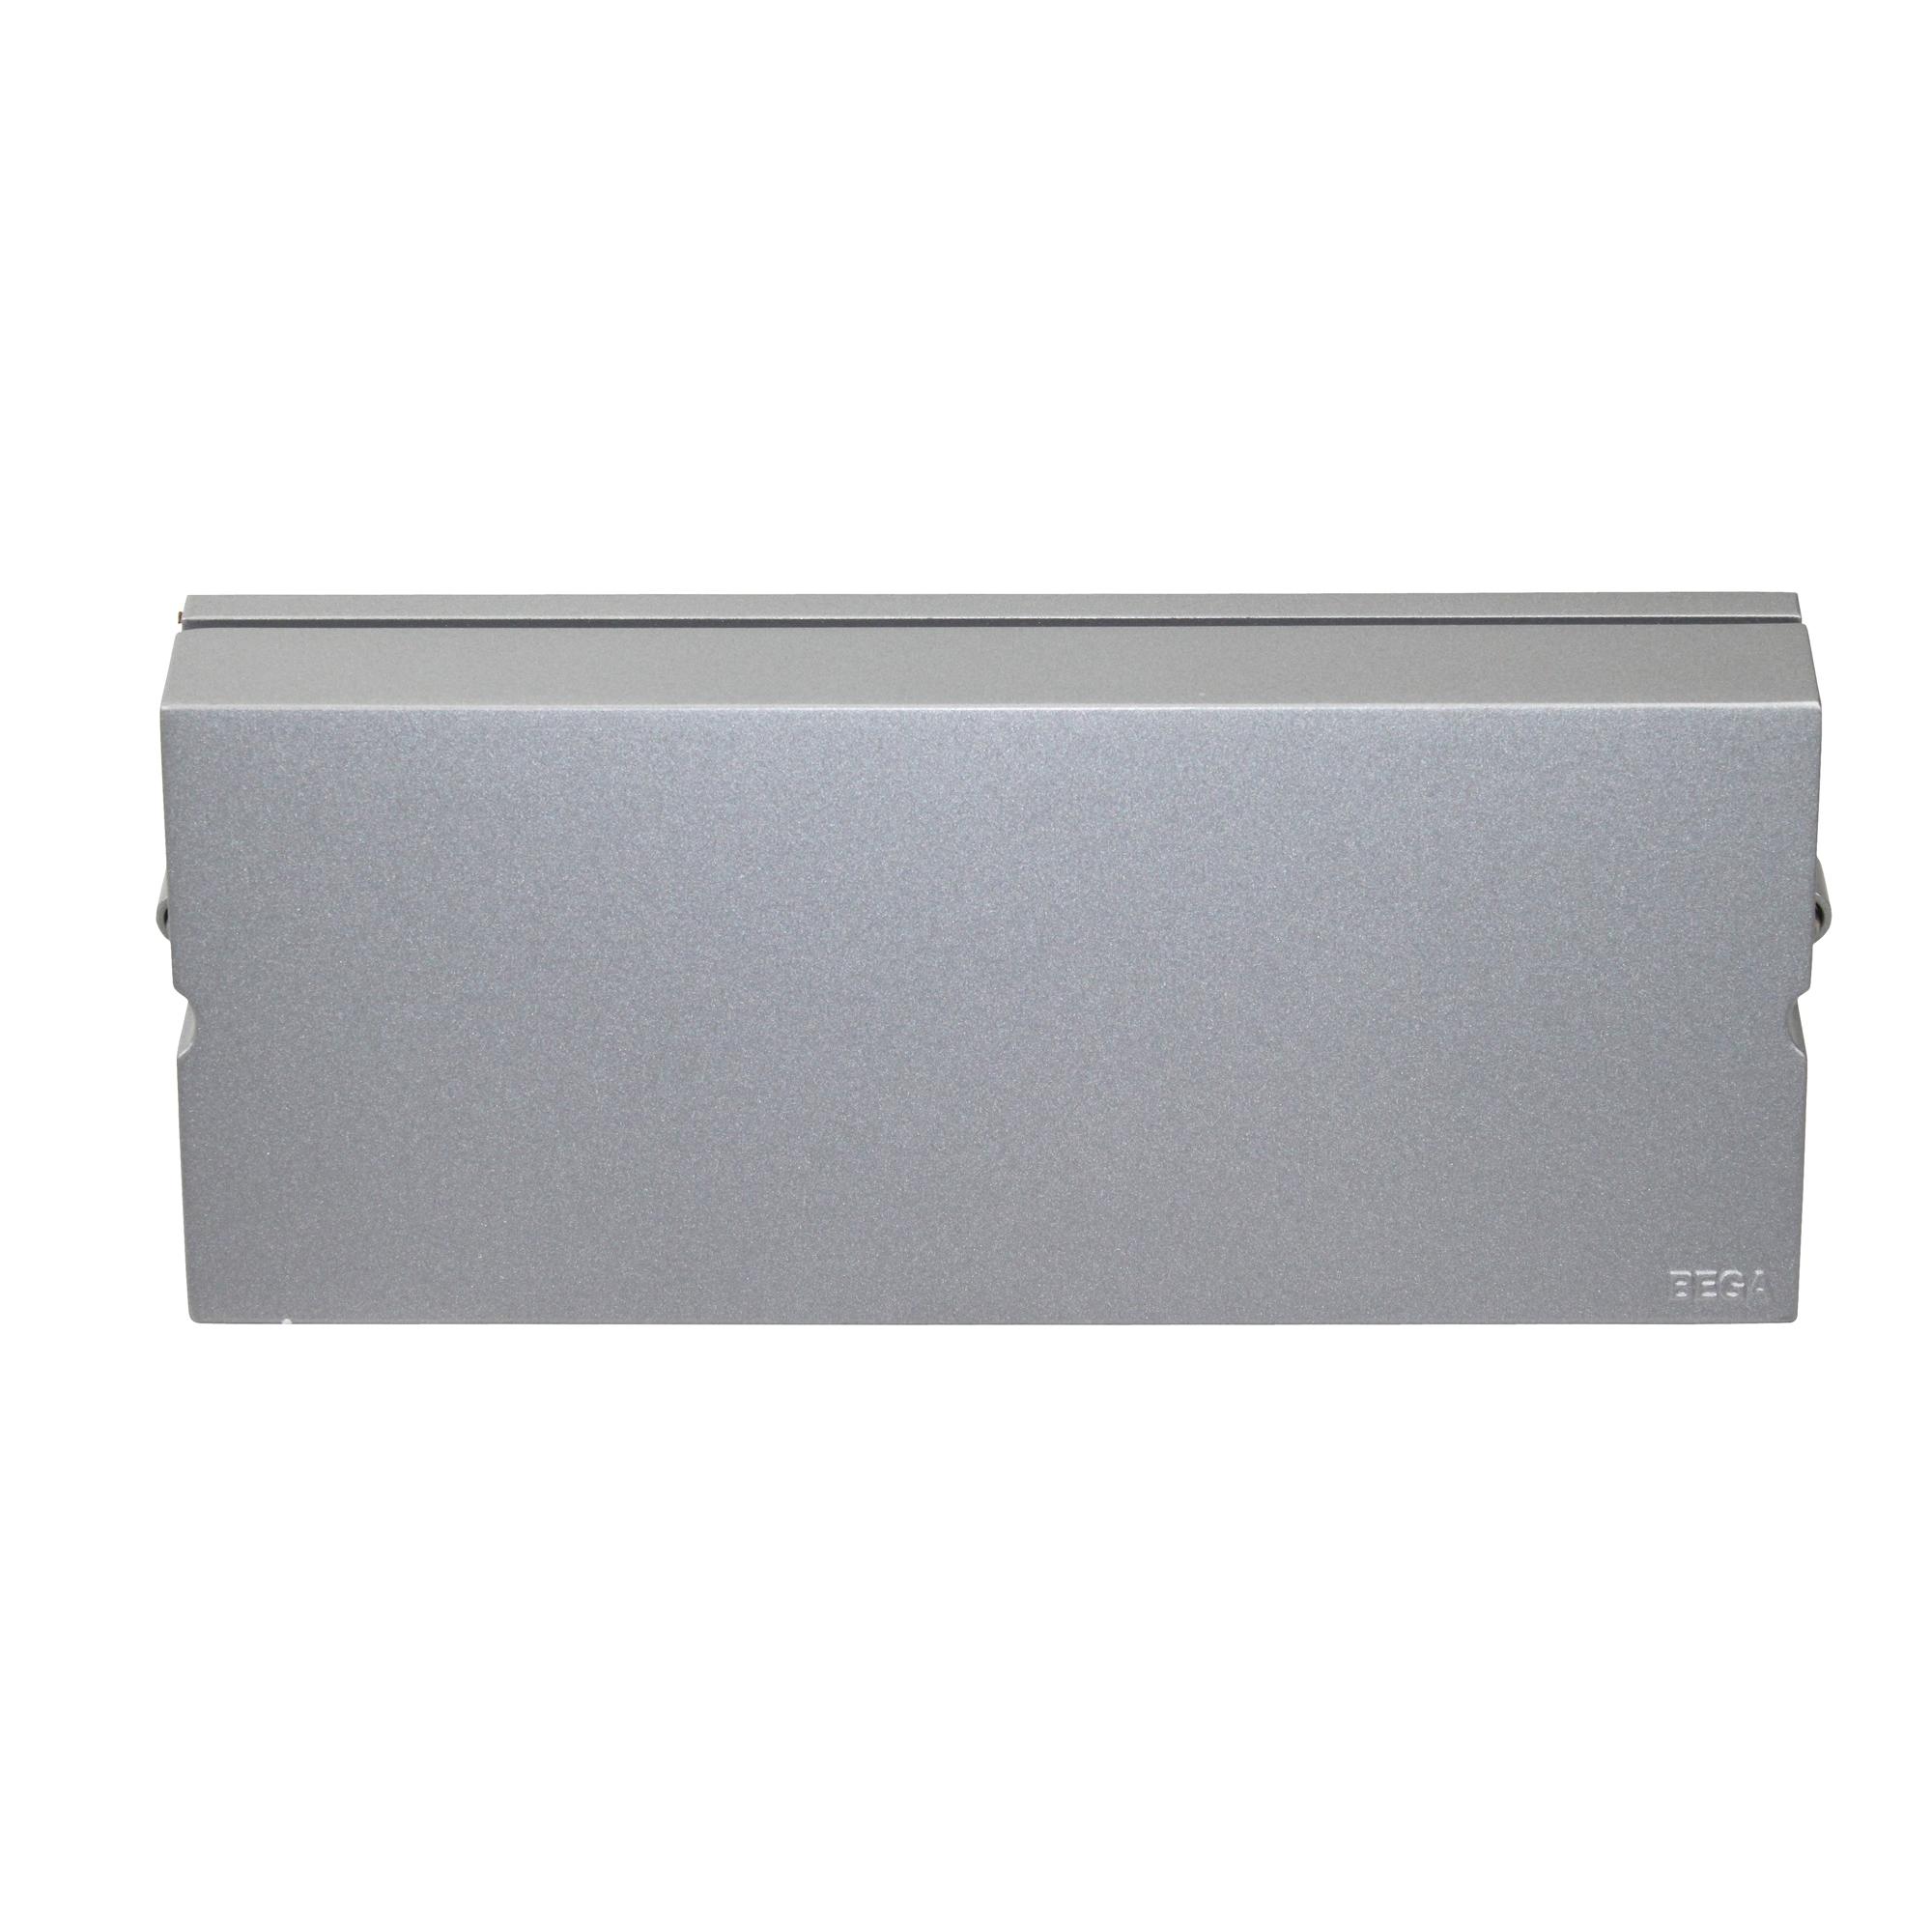 Bega 2294 Wall Luminair Sconce Light Fixture Aluminum F29 277v Silver